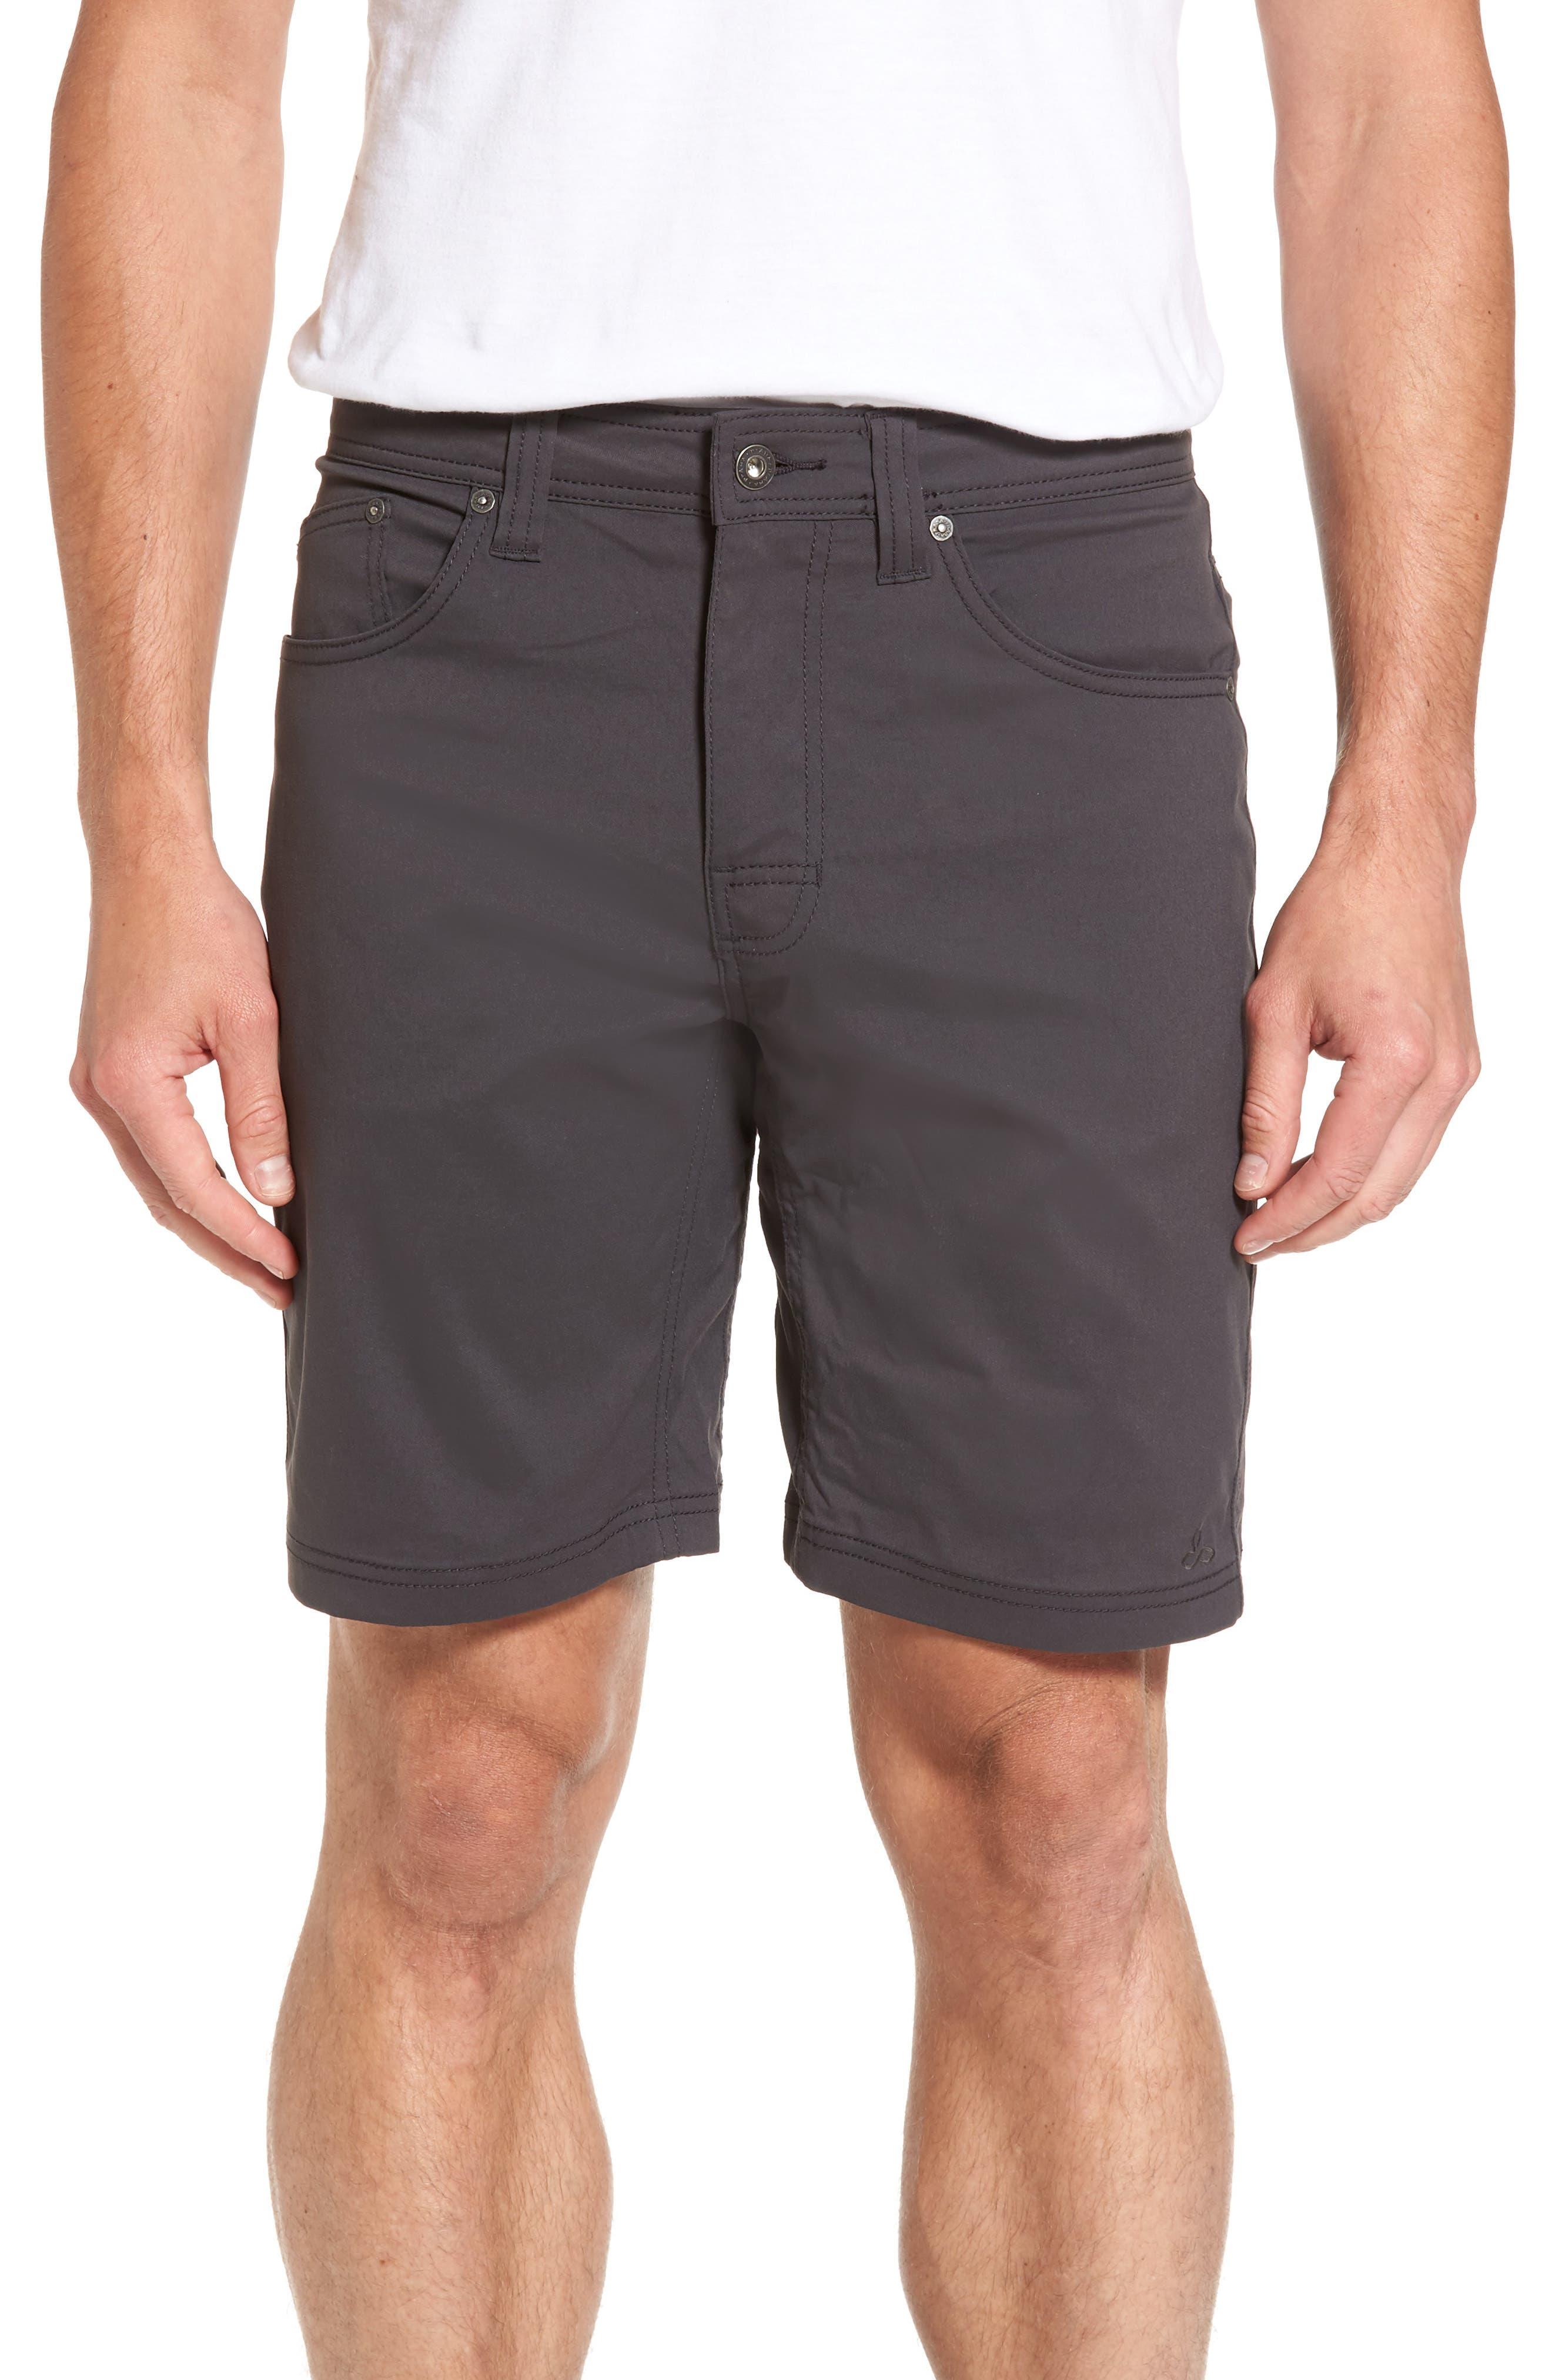 Brion Slim Fit Shorts,                         Main,                         color, Charcoal